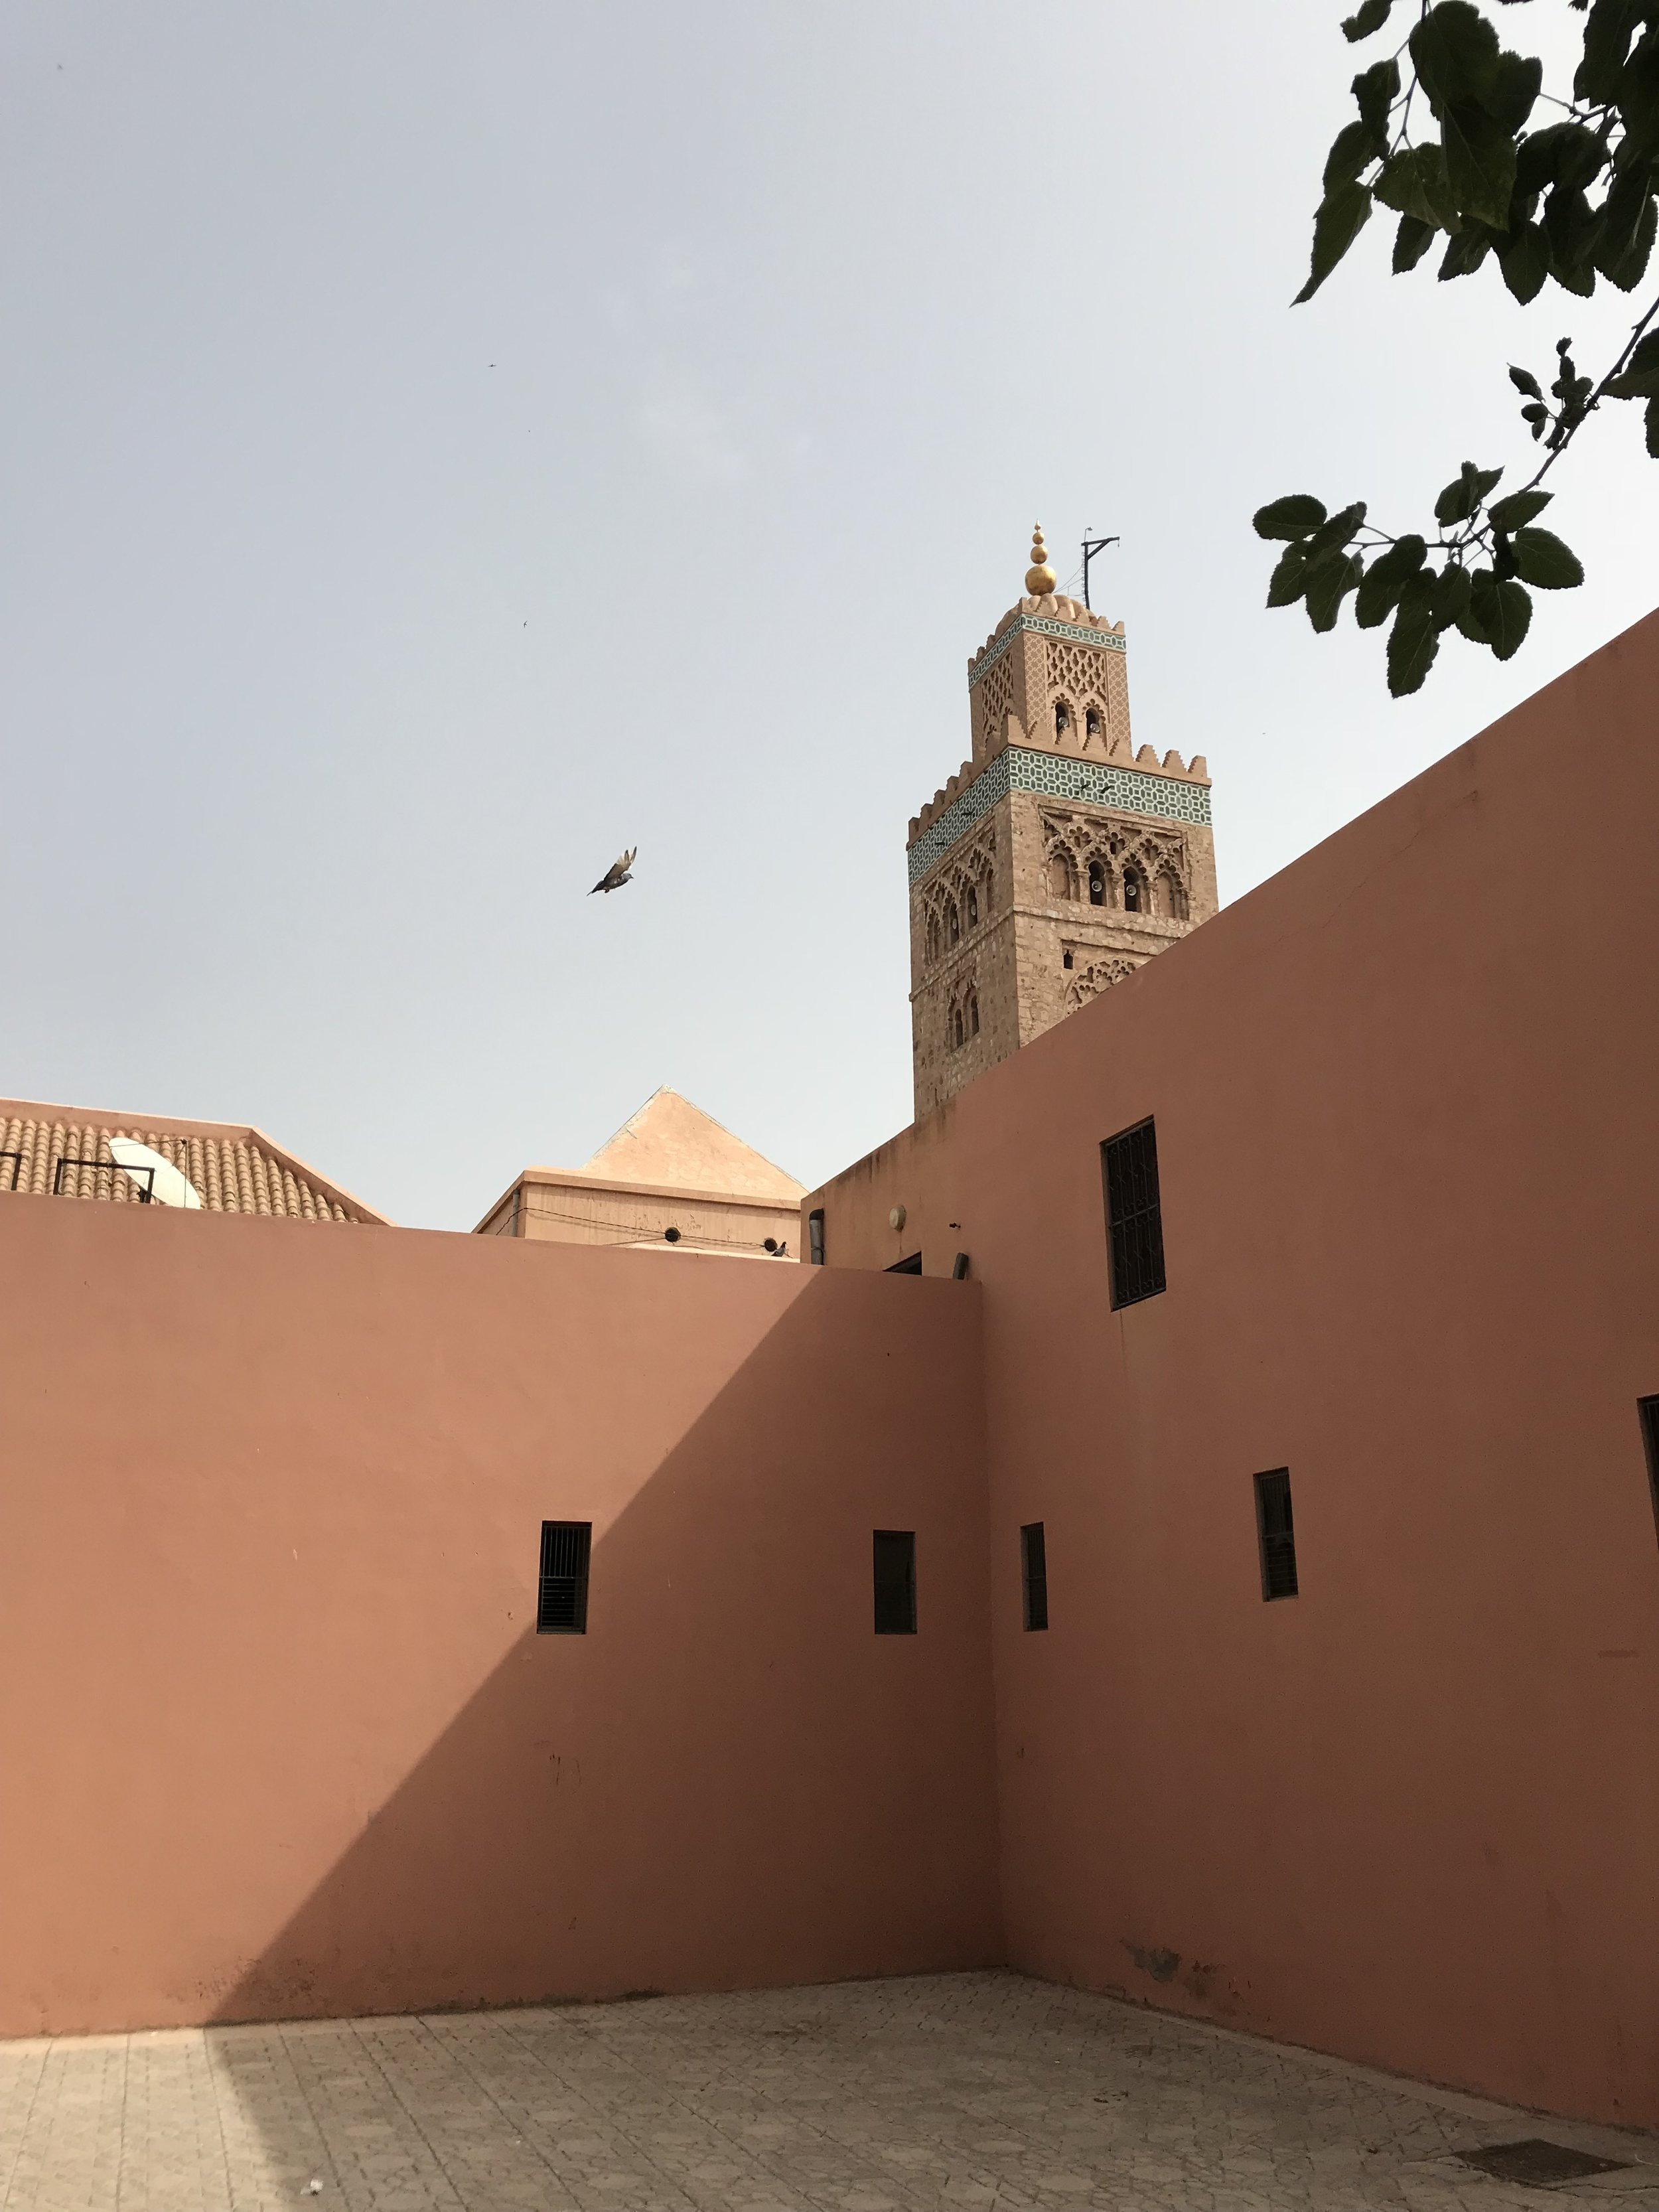 Minaret in Marrakech  Photo provided by Gwendalyn Ryan '20